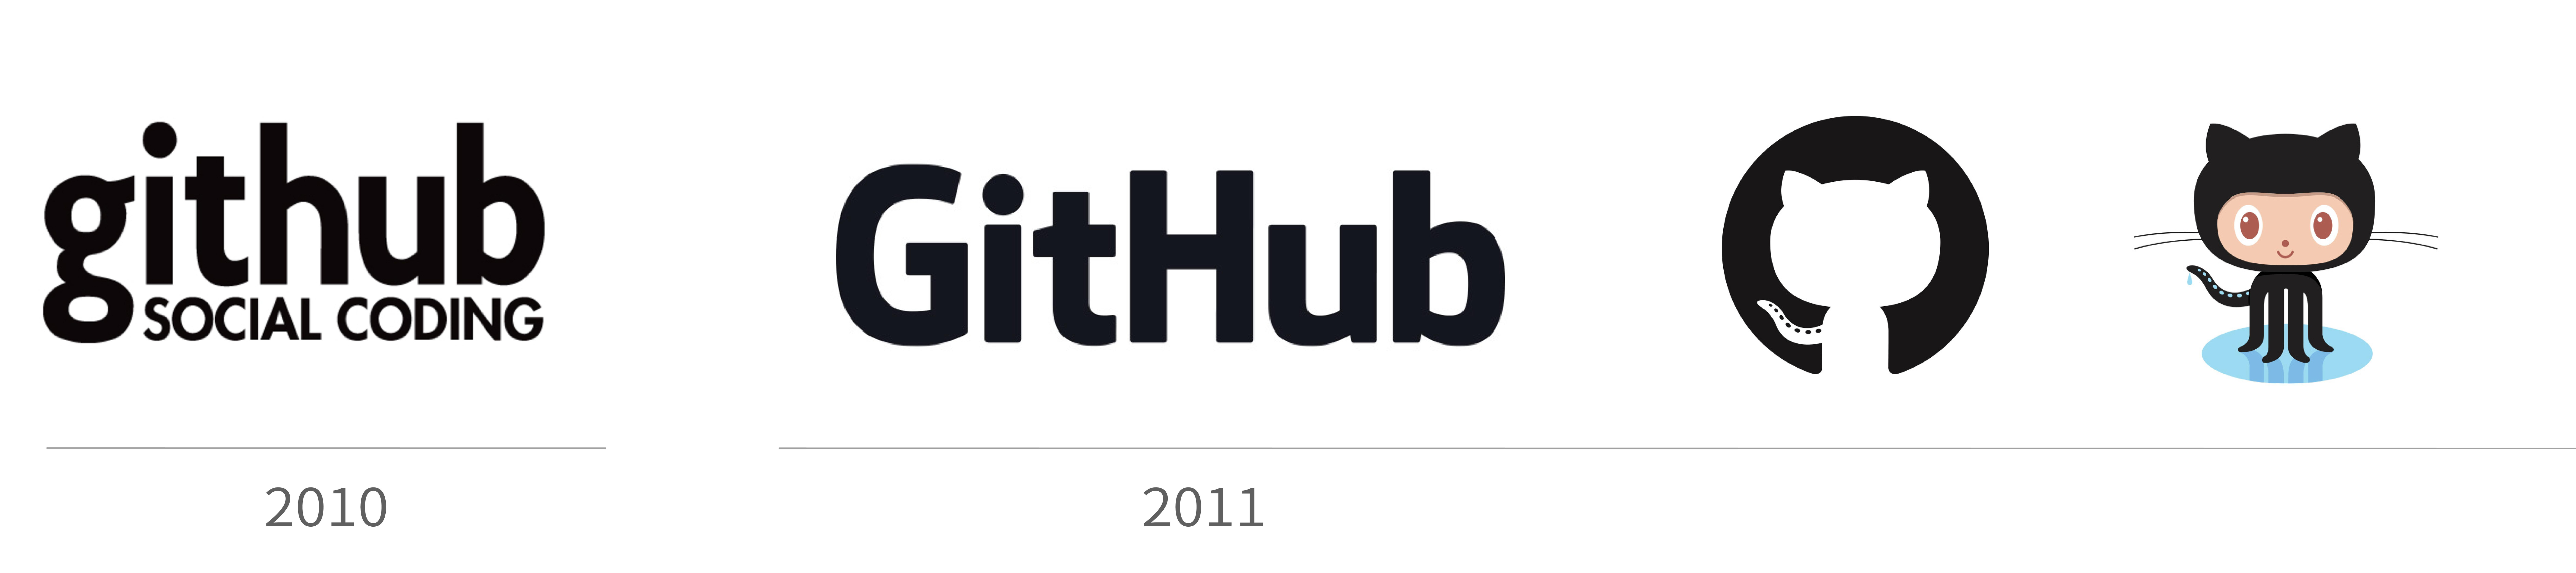 15. cracker_Teamproject 2_ history of brang logo__github